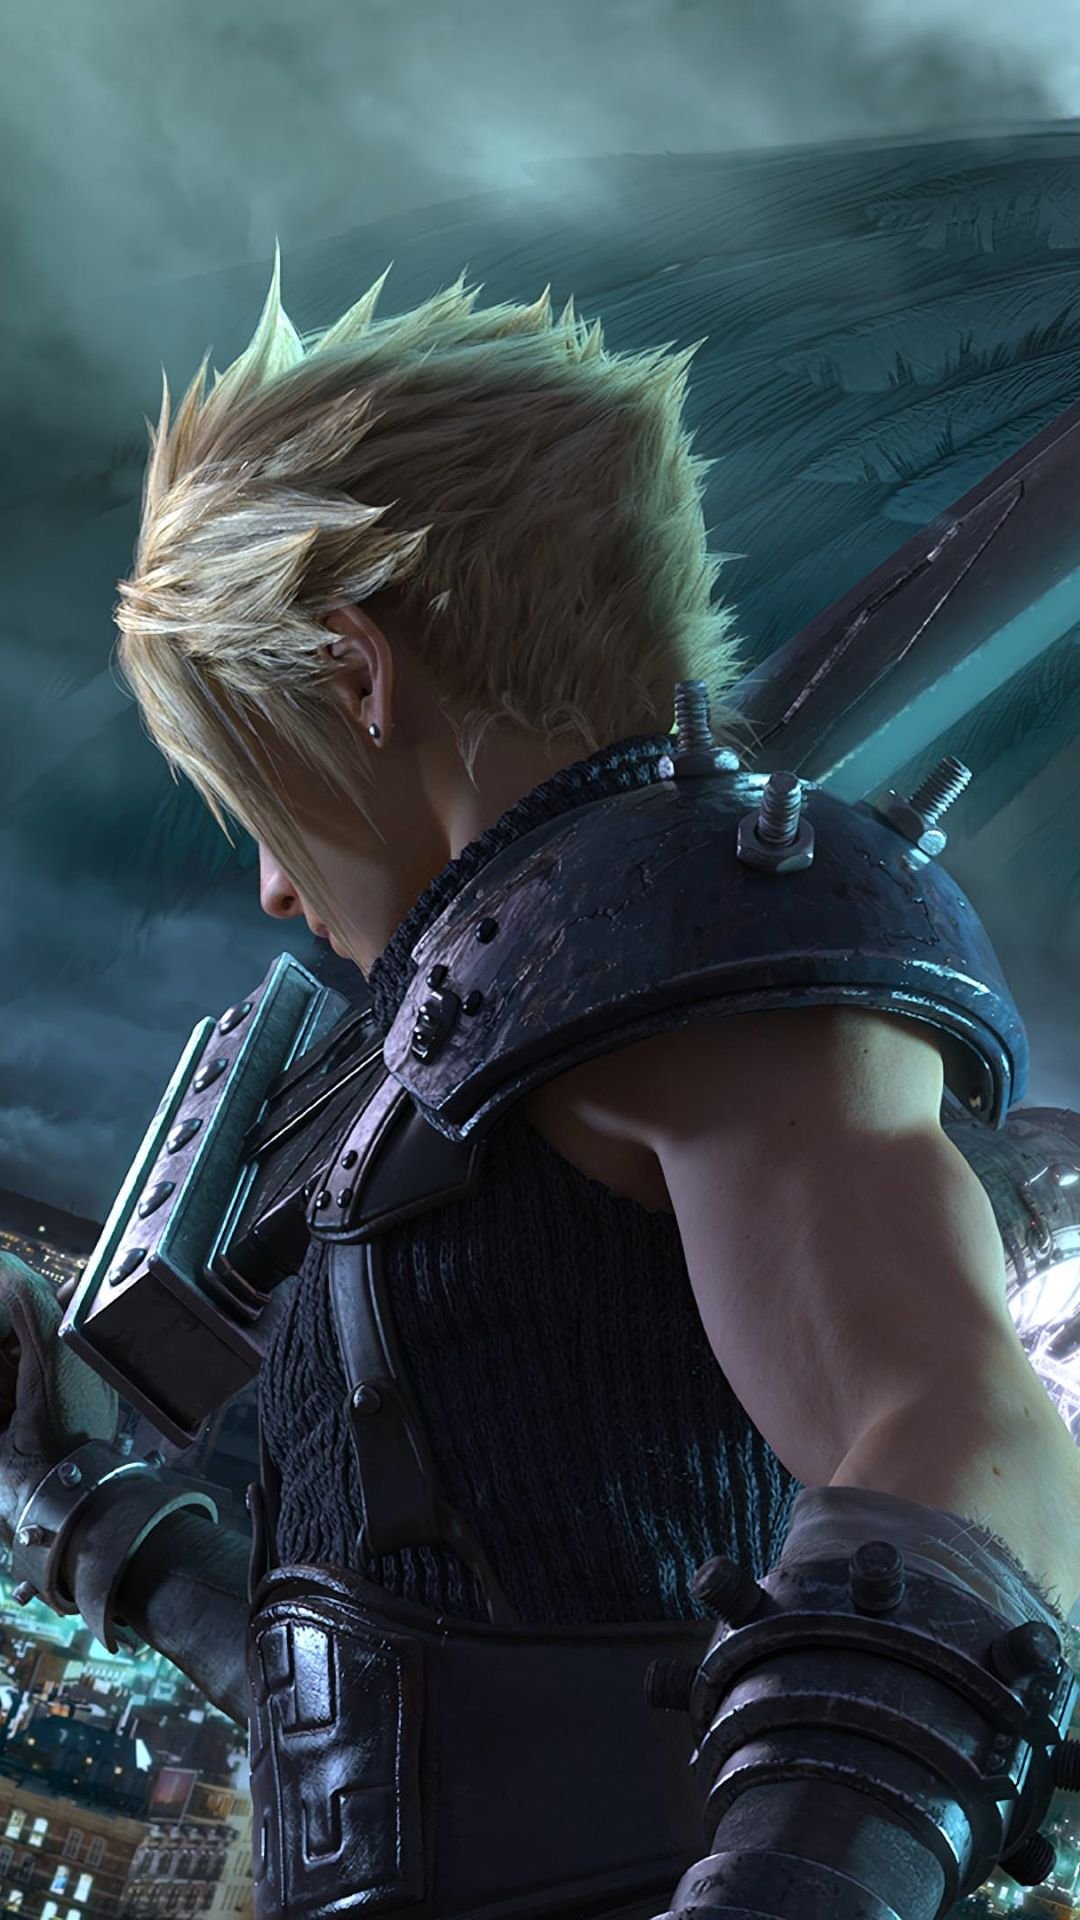 Final Fantasy Wallpaper Cloud Strife Final Fantasy Cloud Strife Final Fantasy Xv Wallpapers Final Fantasy Vii Remake